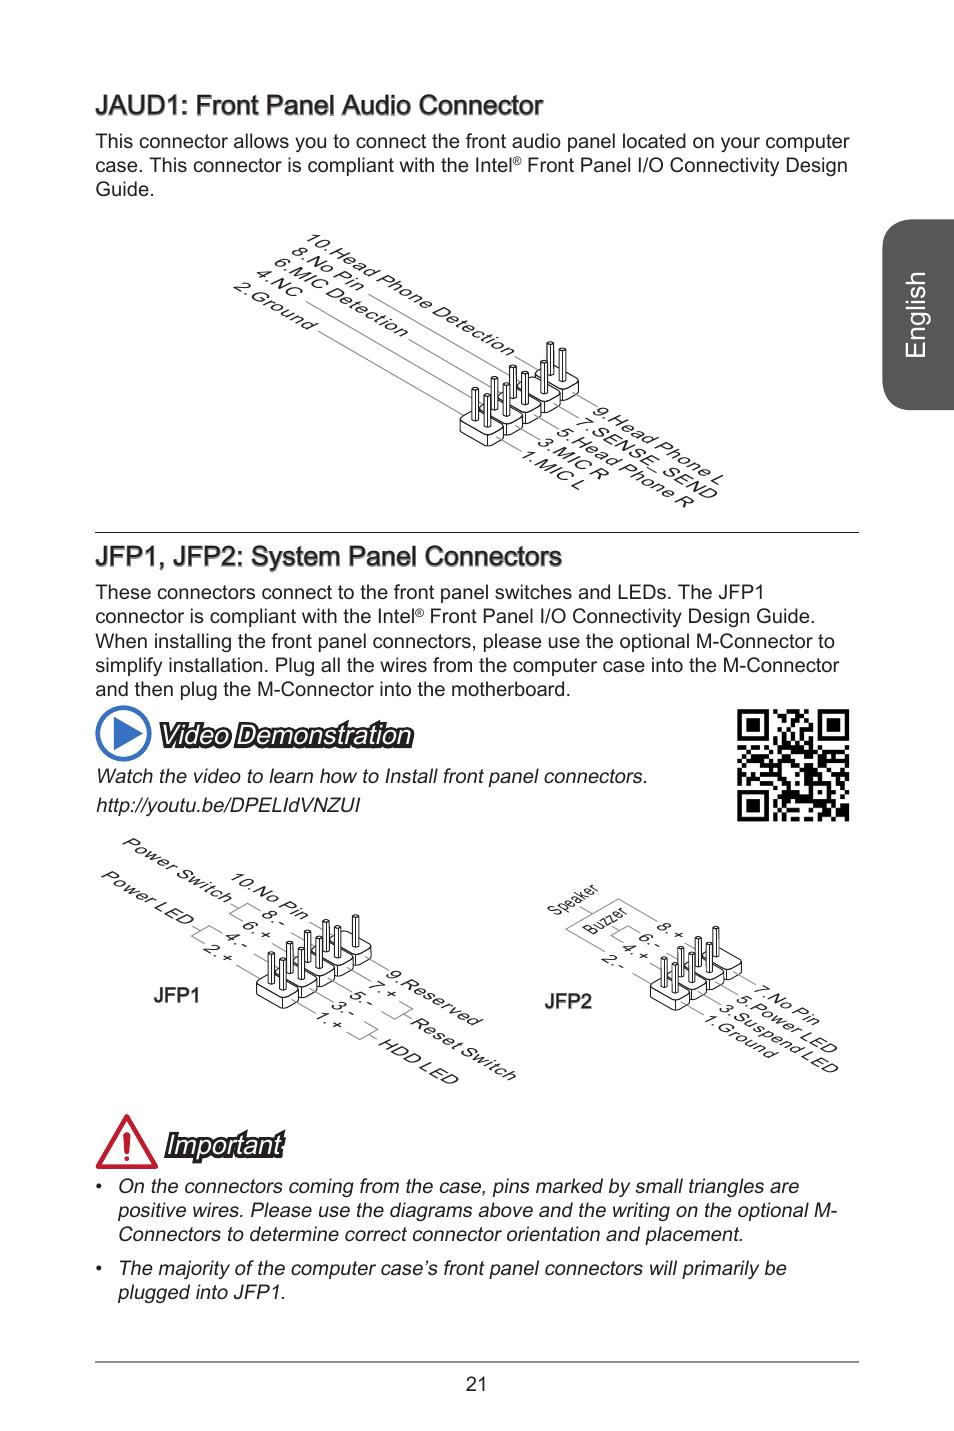 Front Panel Audio Wiring Diagram Schematics Diagrams 97 Gmc Van Stereo English Jaud Connector Jfp Jfp2 System Rh Manualsdir Com Gm Radio